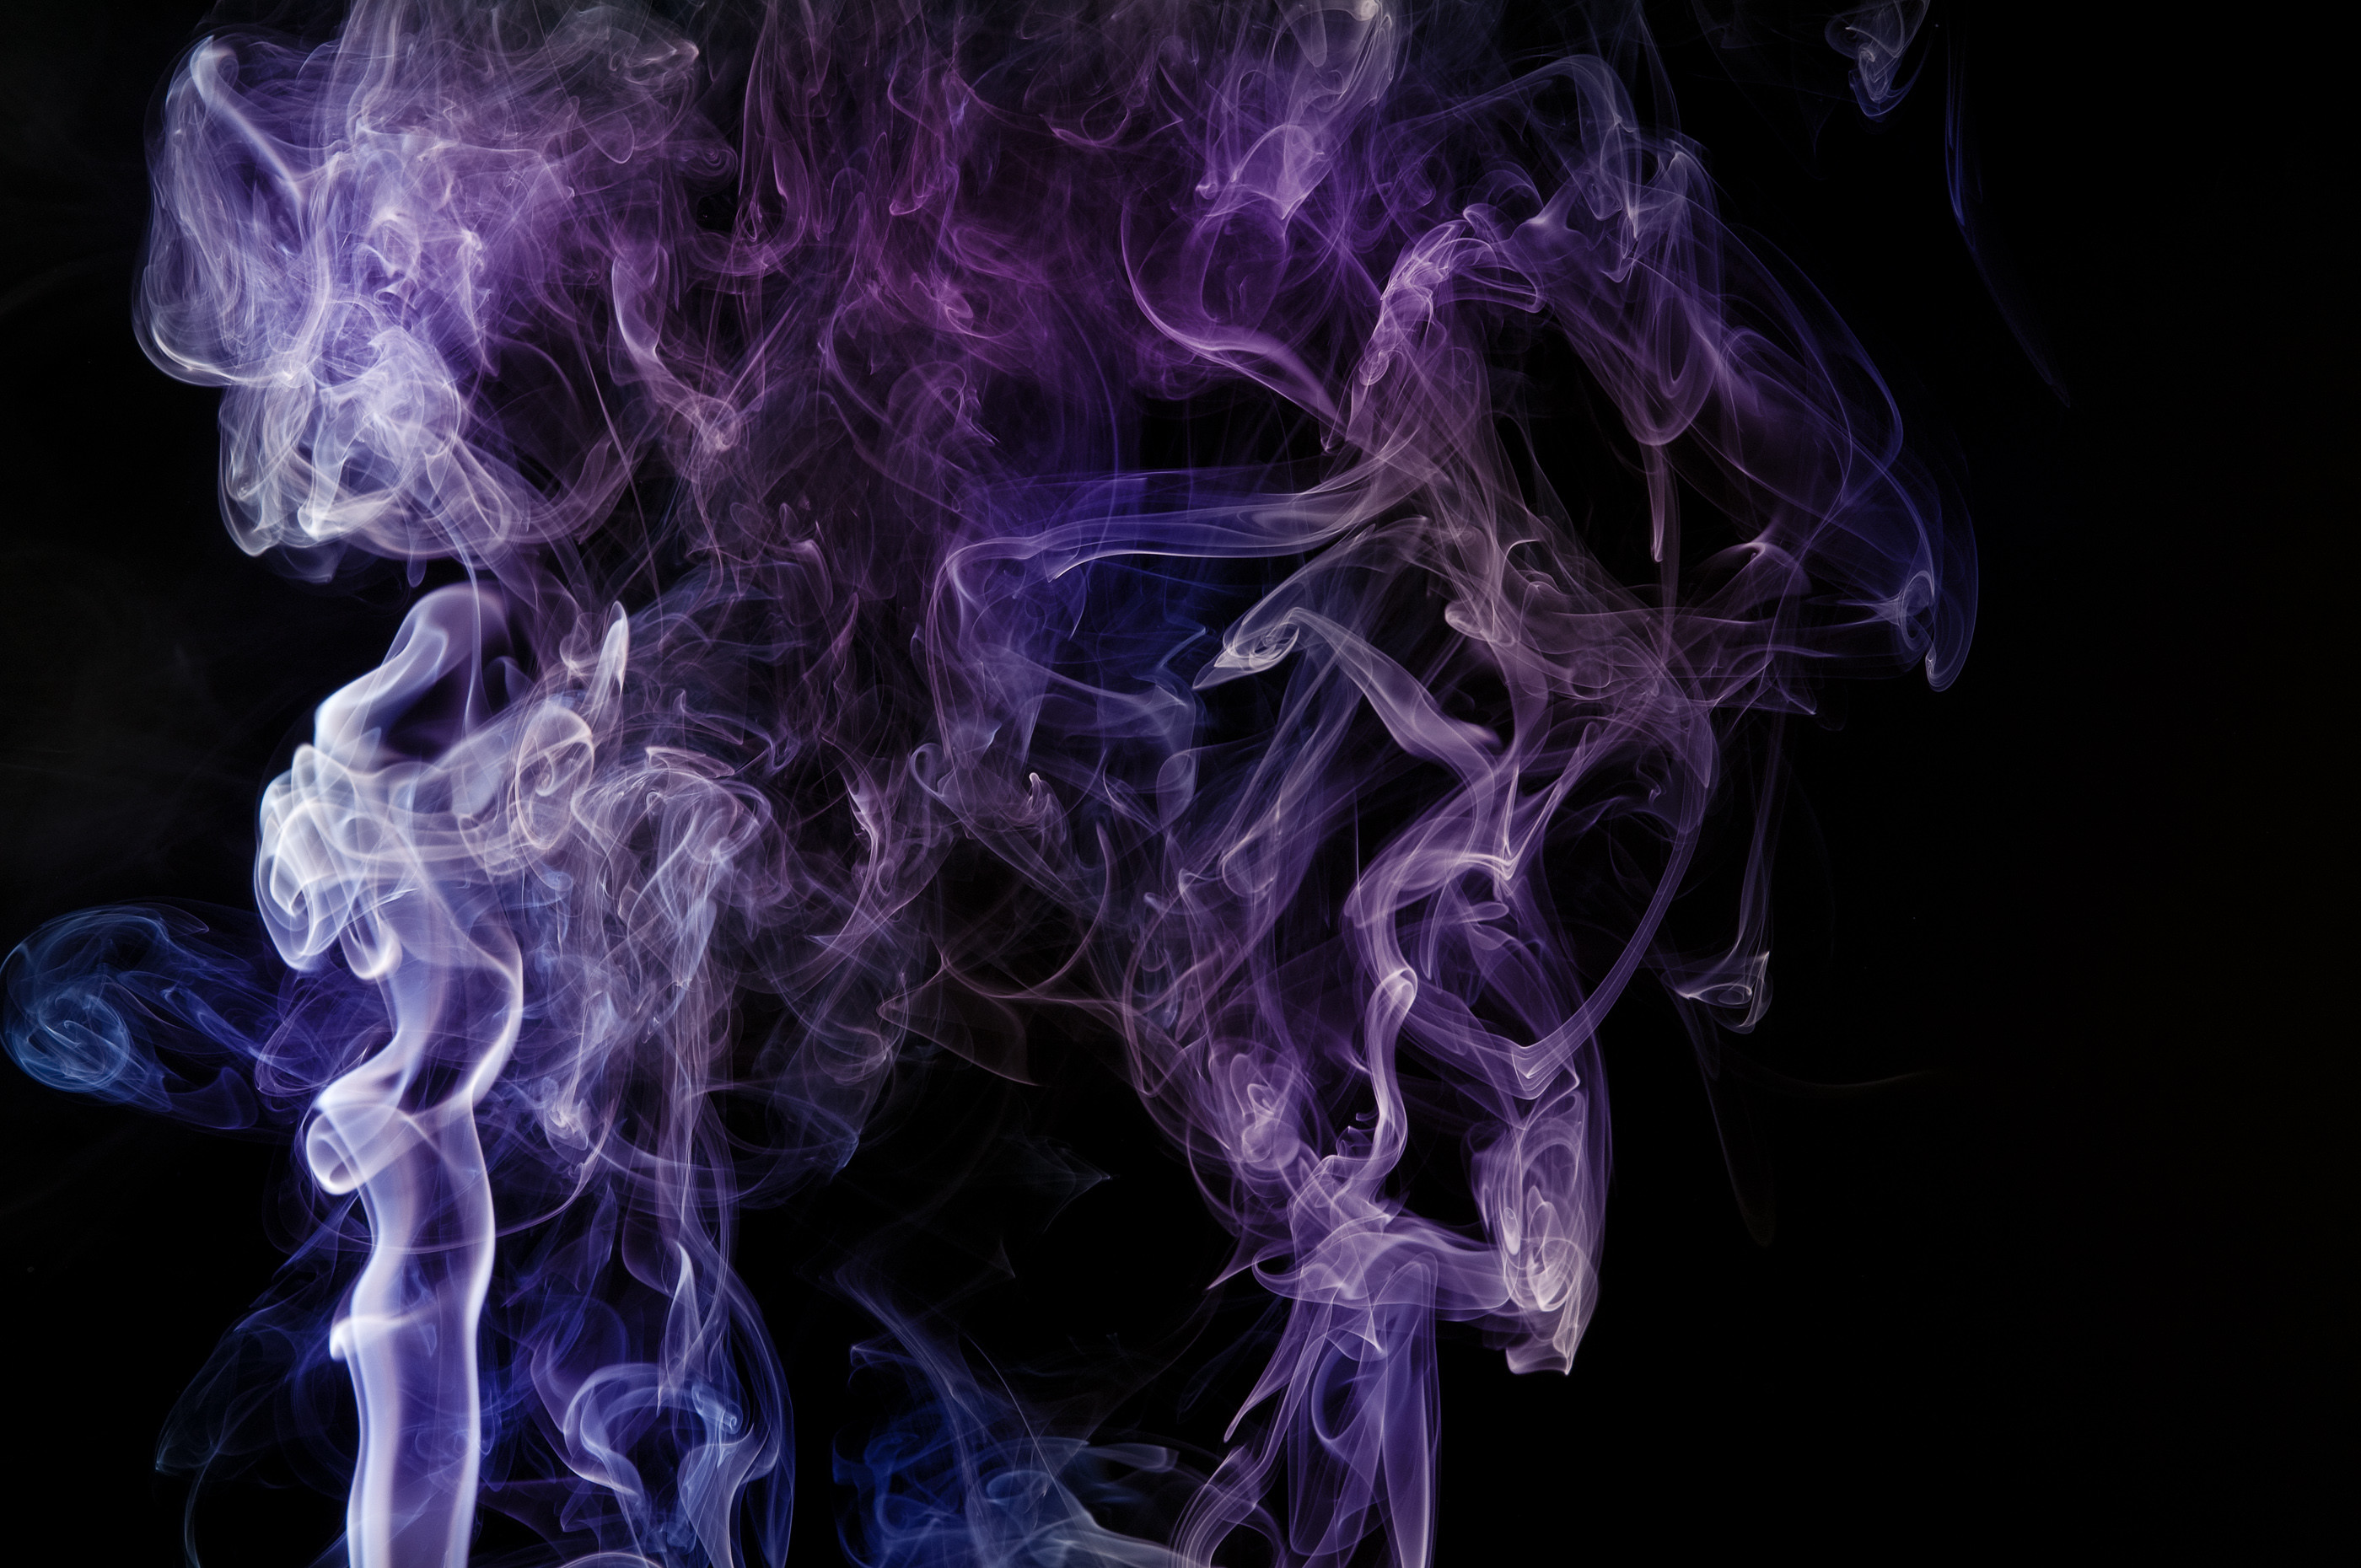 trippy smoke backgrounds tumblr 183��